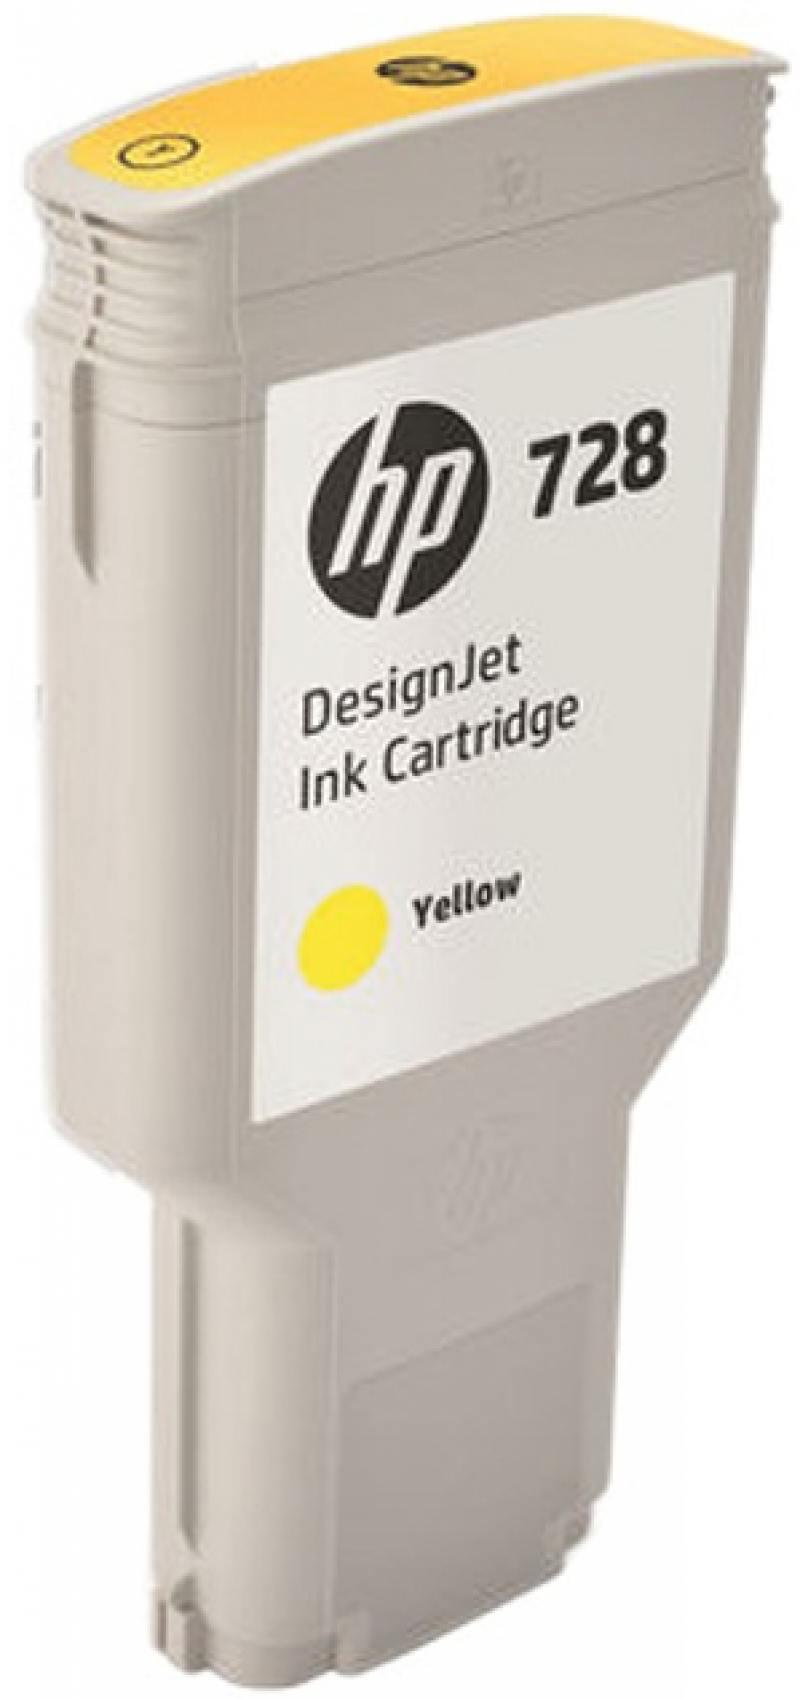 Картридж HP F9K15A (HP 728) для DesignJet T730, T830. Жёлтый. 300 мл. hp designjet t830 36 f9a30a